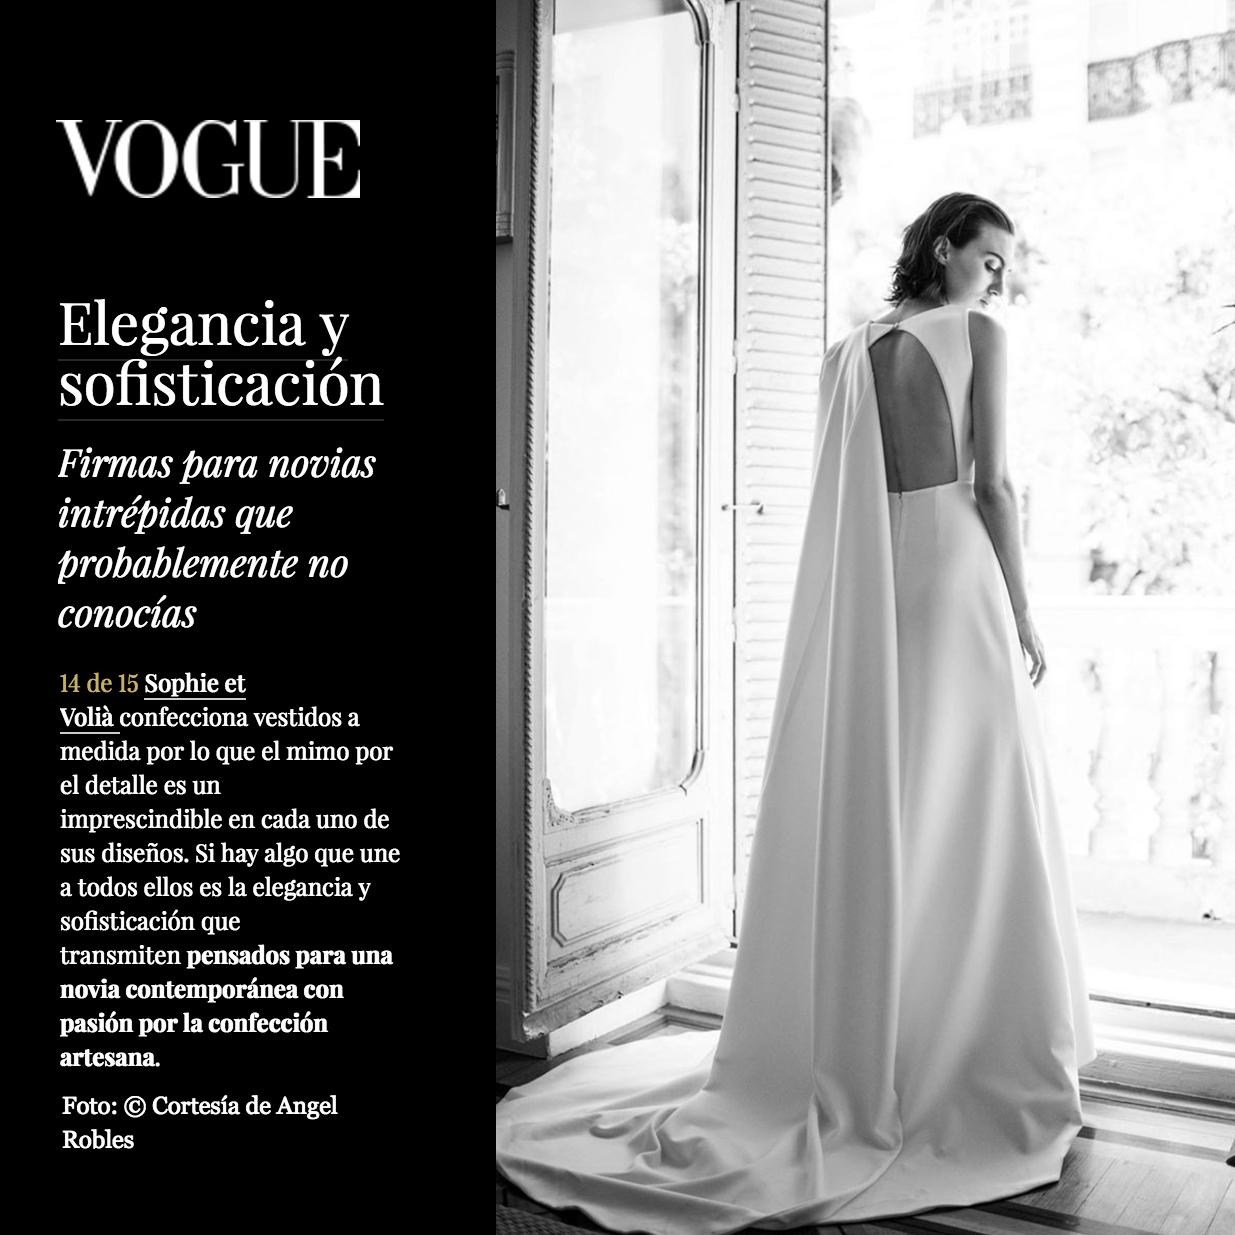 Vogue1-copy-1.jpg